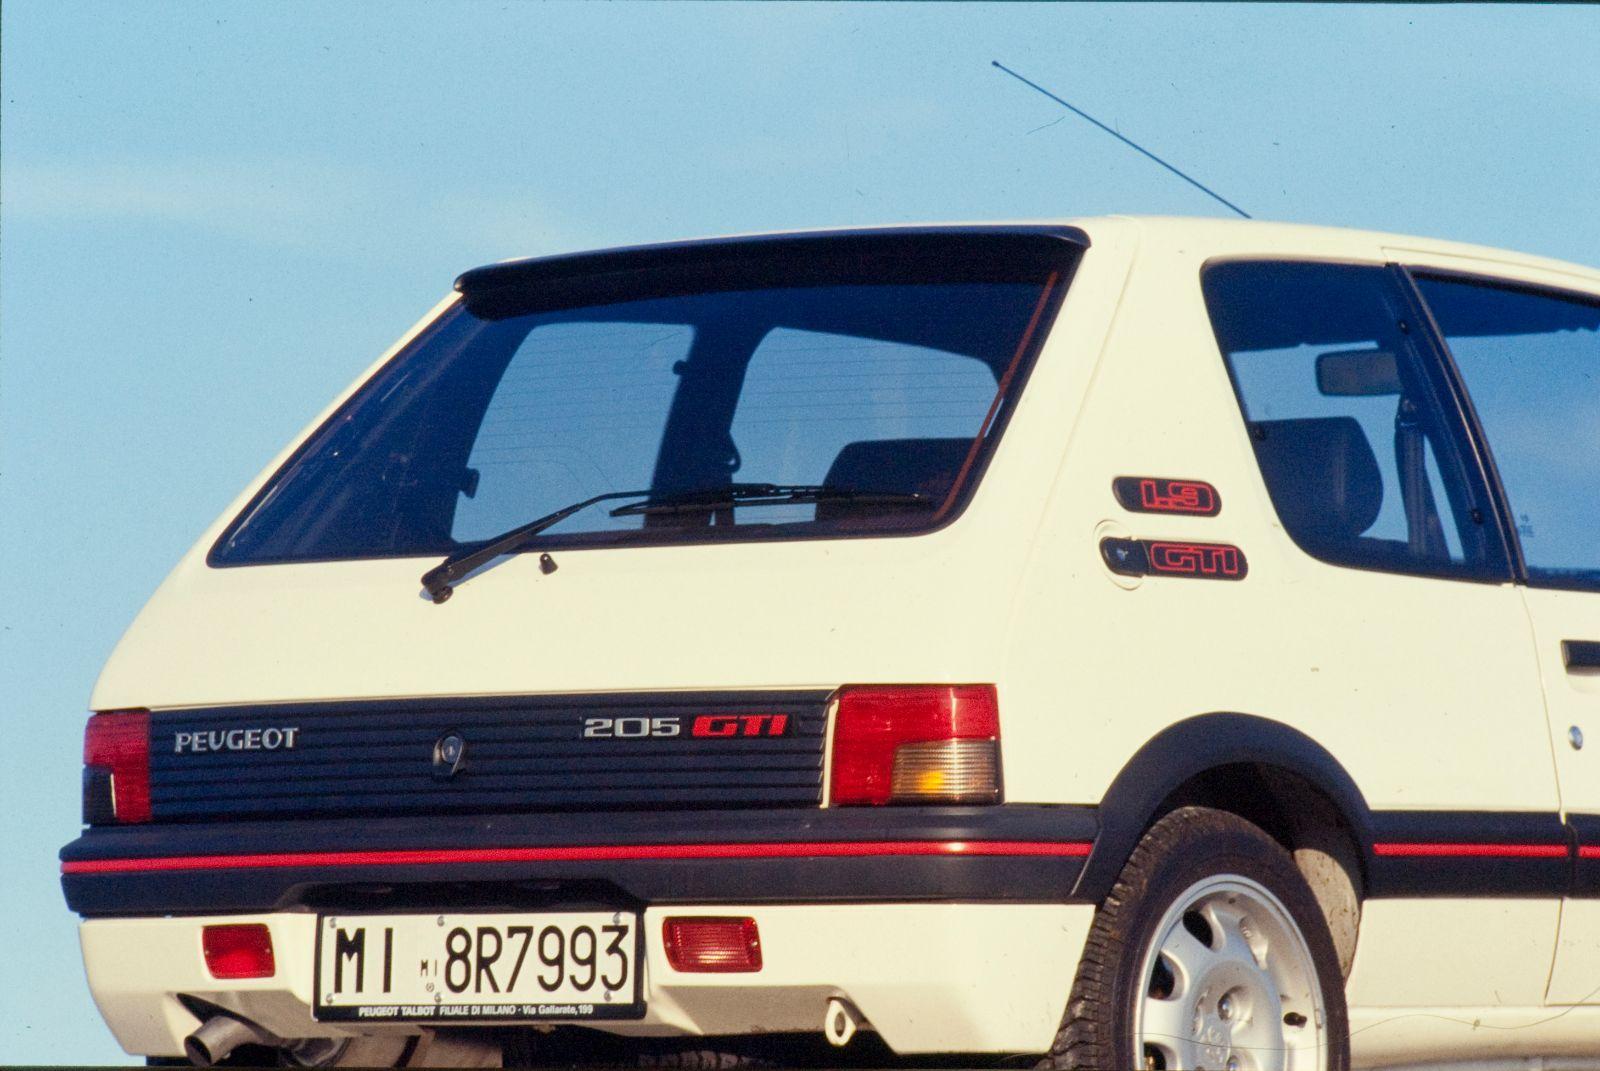 peugeot-205-gti-1-9-1990-6